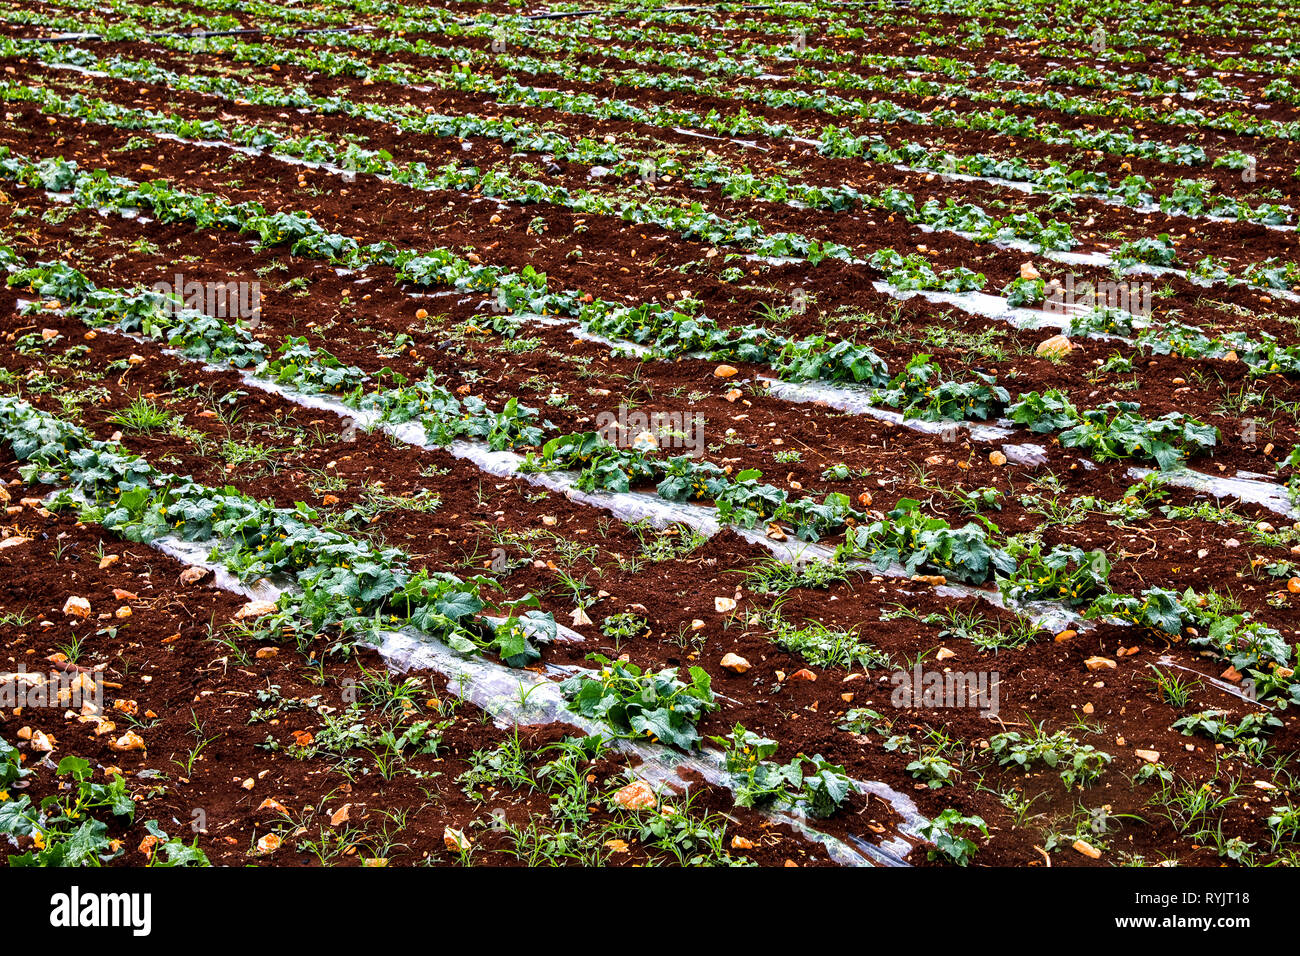 Campo appartenente a Aiman Mohammed Omar Dararmi, un client di acad finanza, in Ras Al Farrah, West Bank, Palestina. Immagini Stock